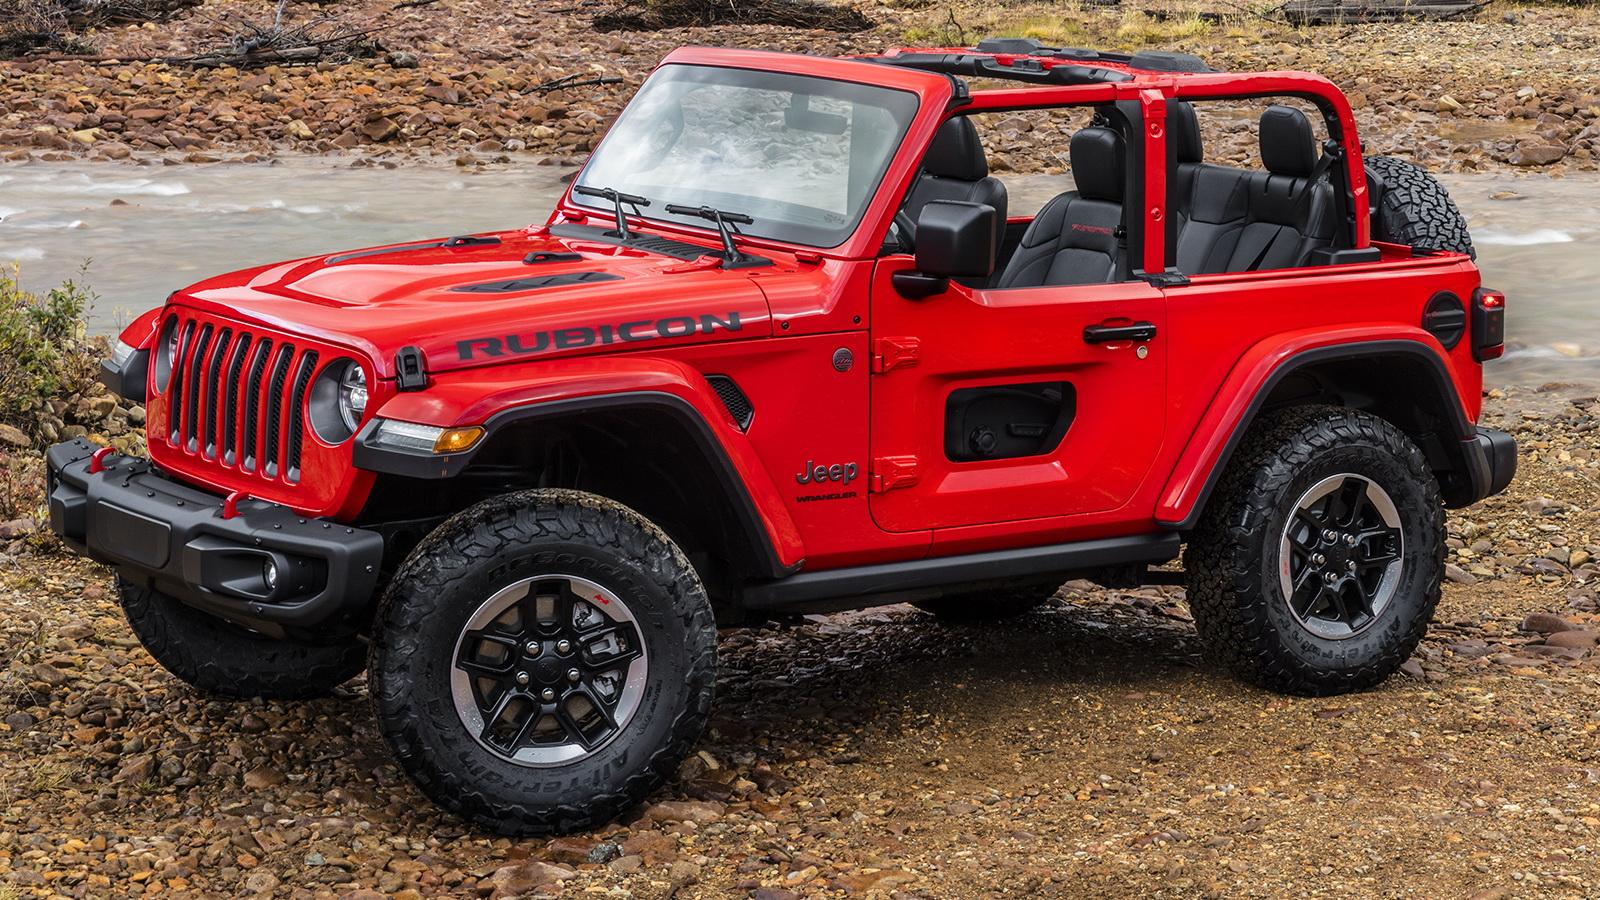 new jeep wragler s half doors won t be available until 2019. Black Bedroom Furniture Sets. Home Design Ideas